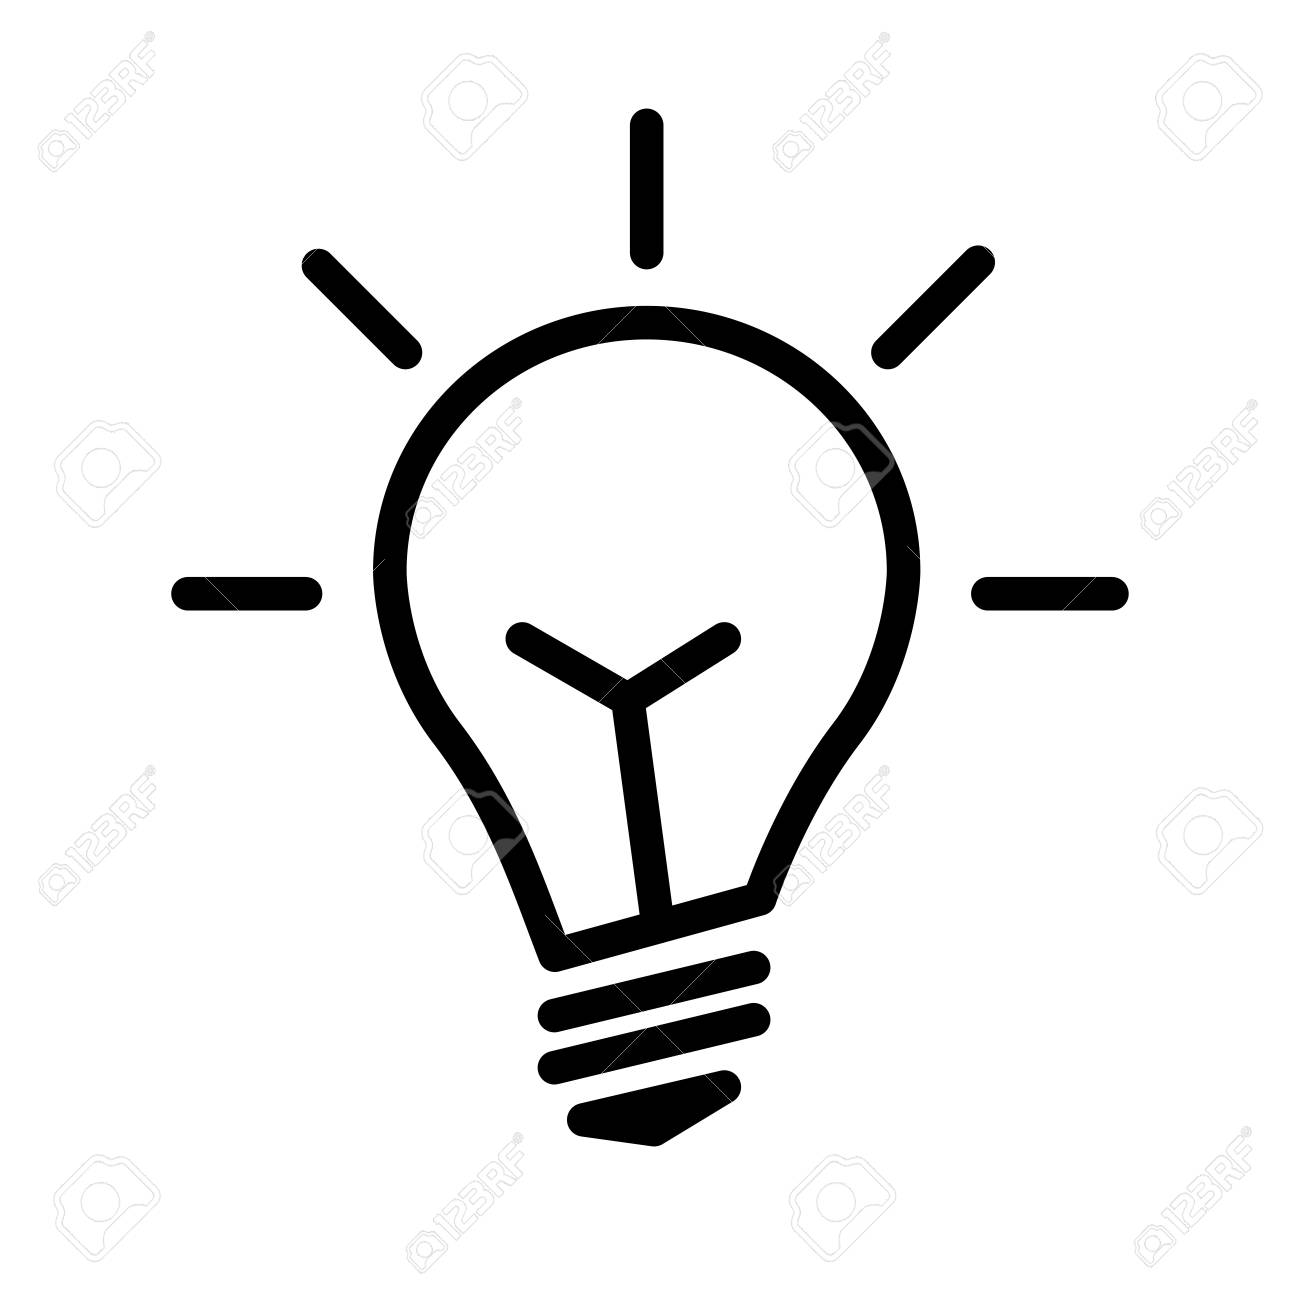 Fantastic Lamp Schematic Symbol Photos - Electrical Diagram Ideas ...